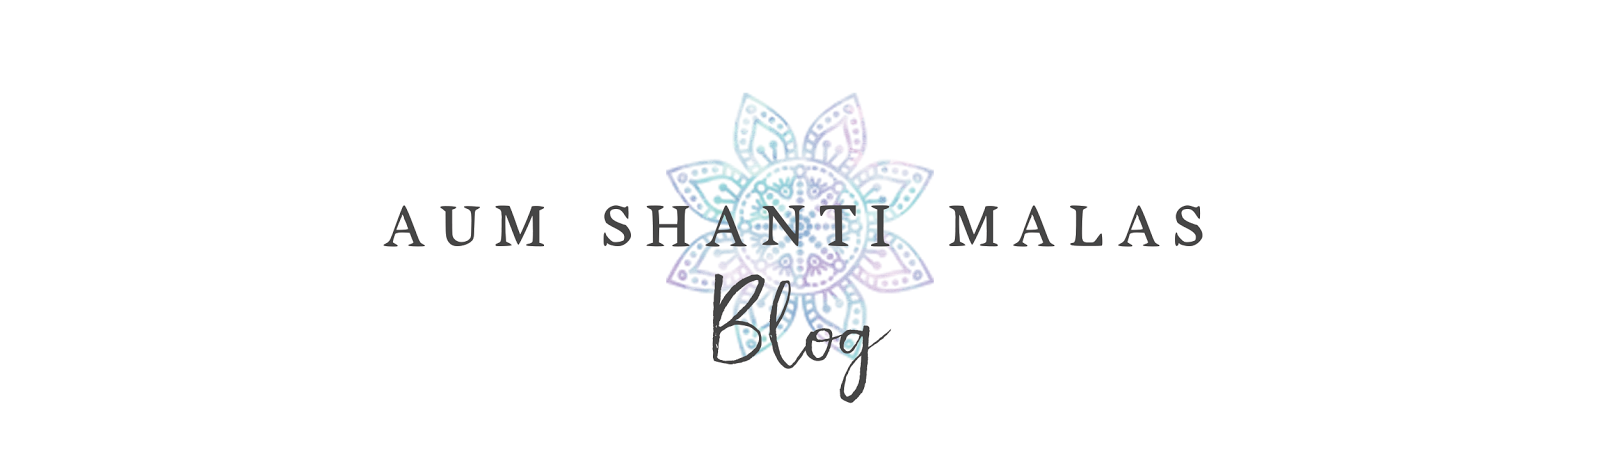 Aum Shanti Malas Blog